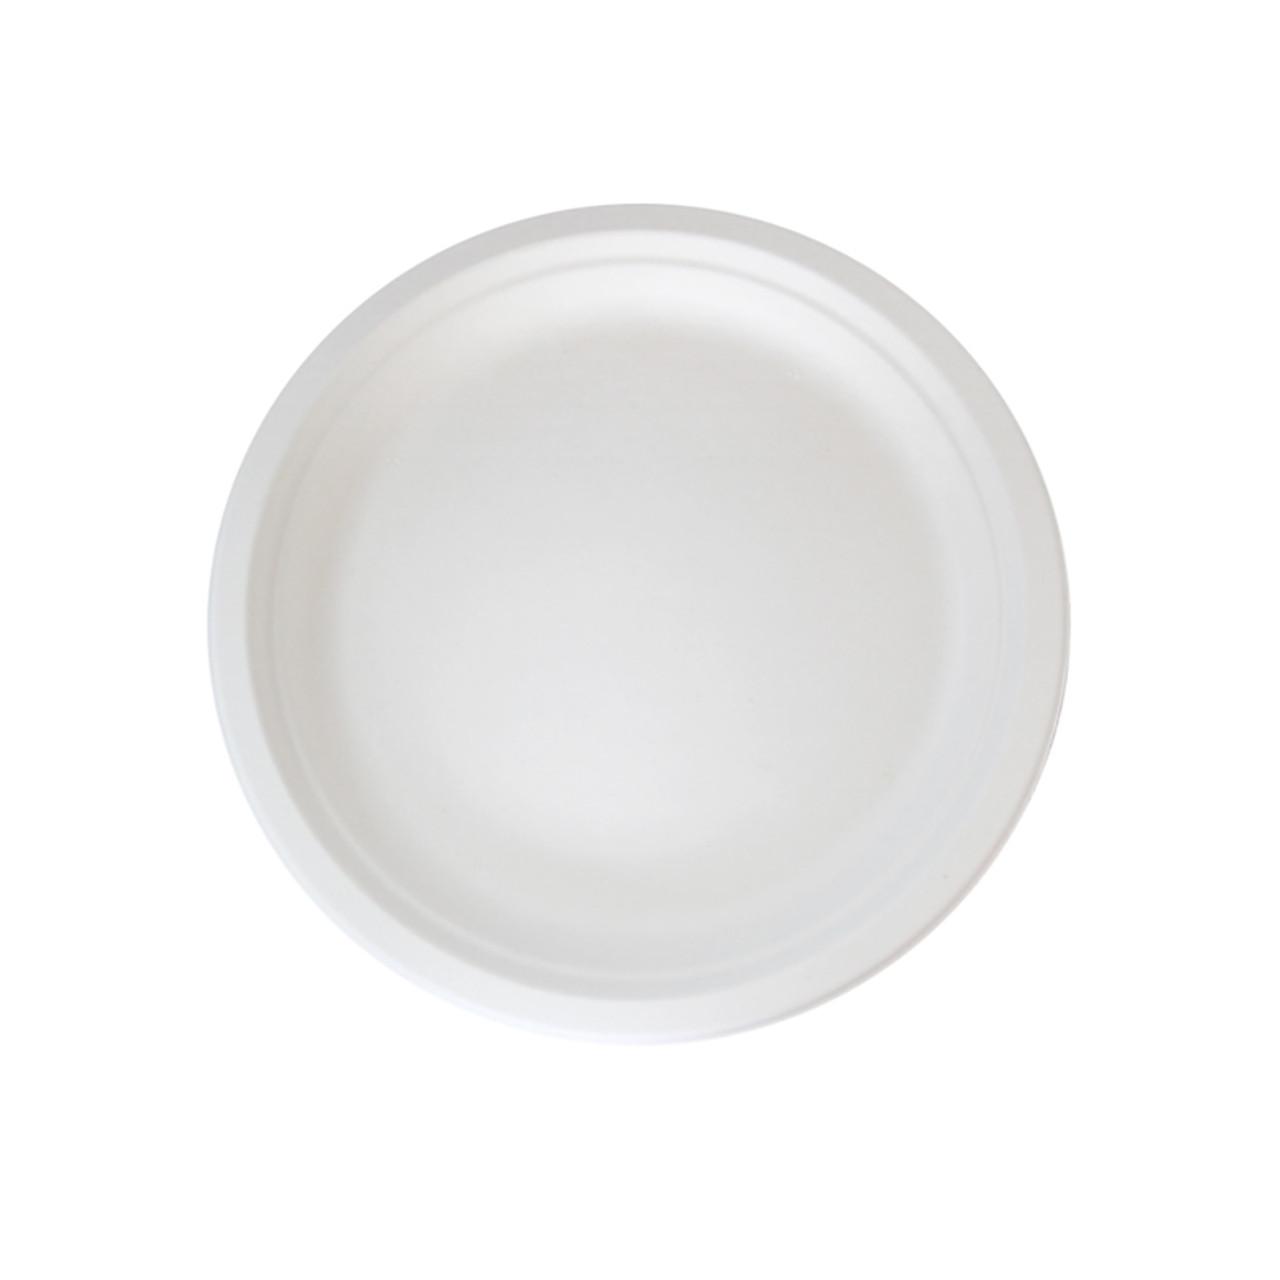 Round Sugarcane Plate - Dia:7in